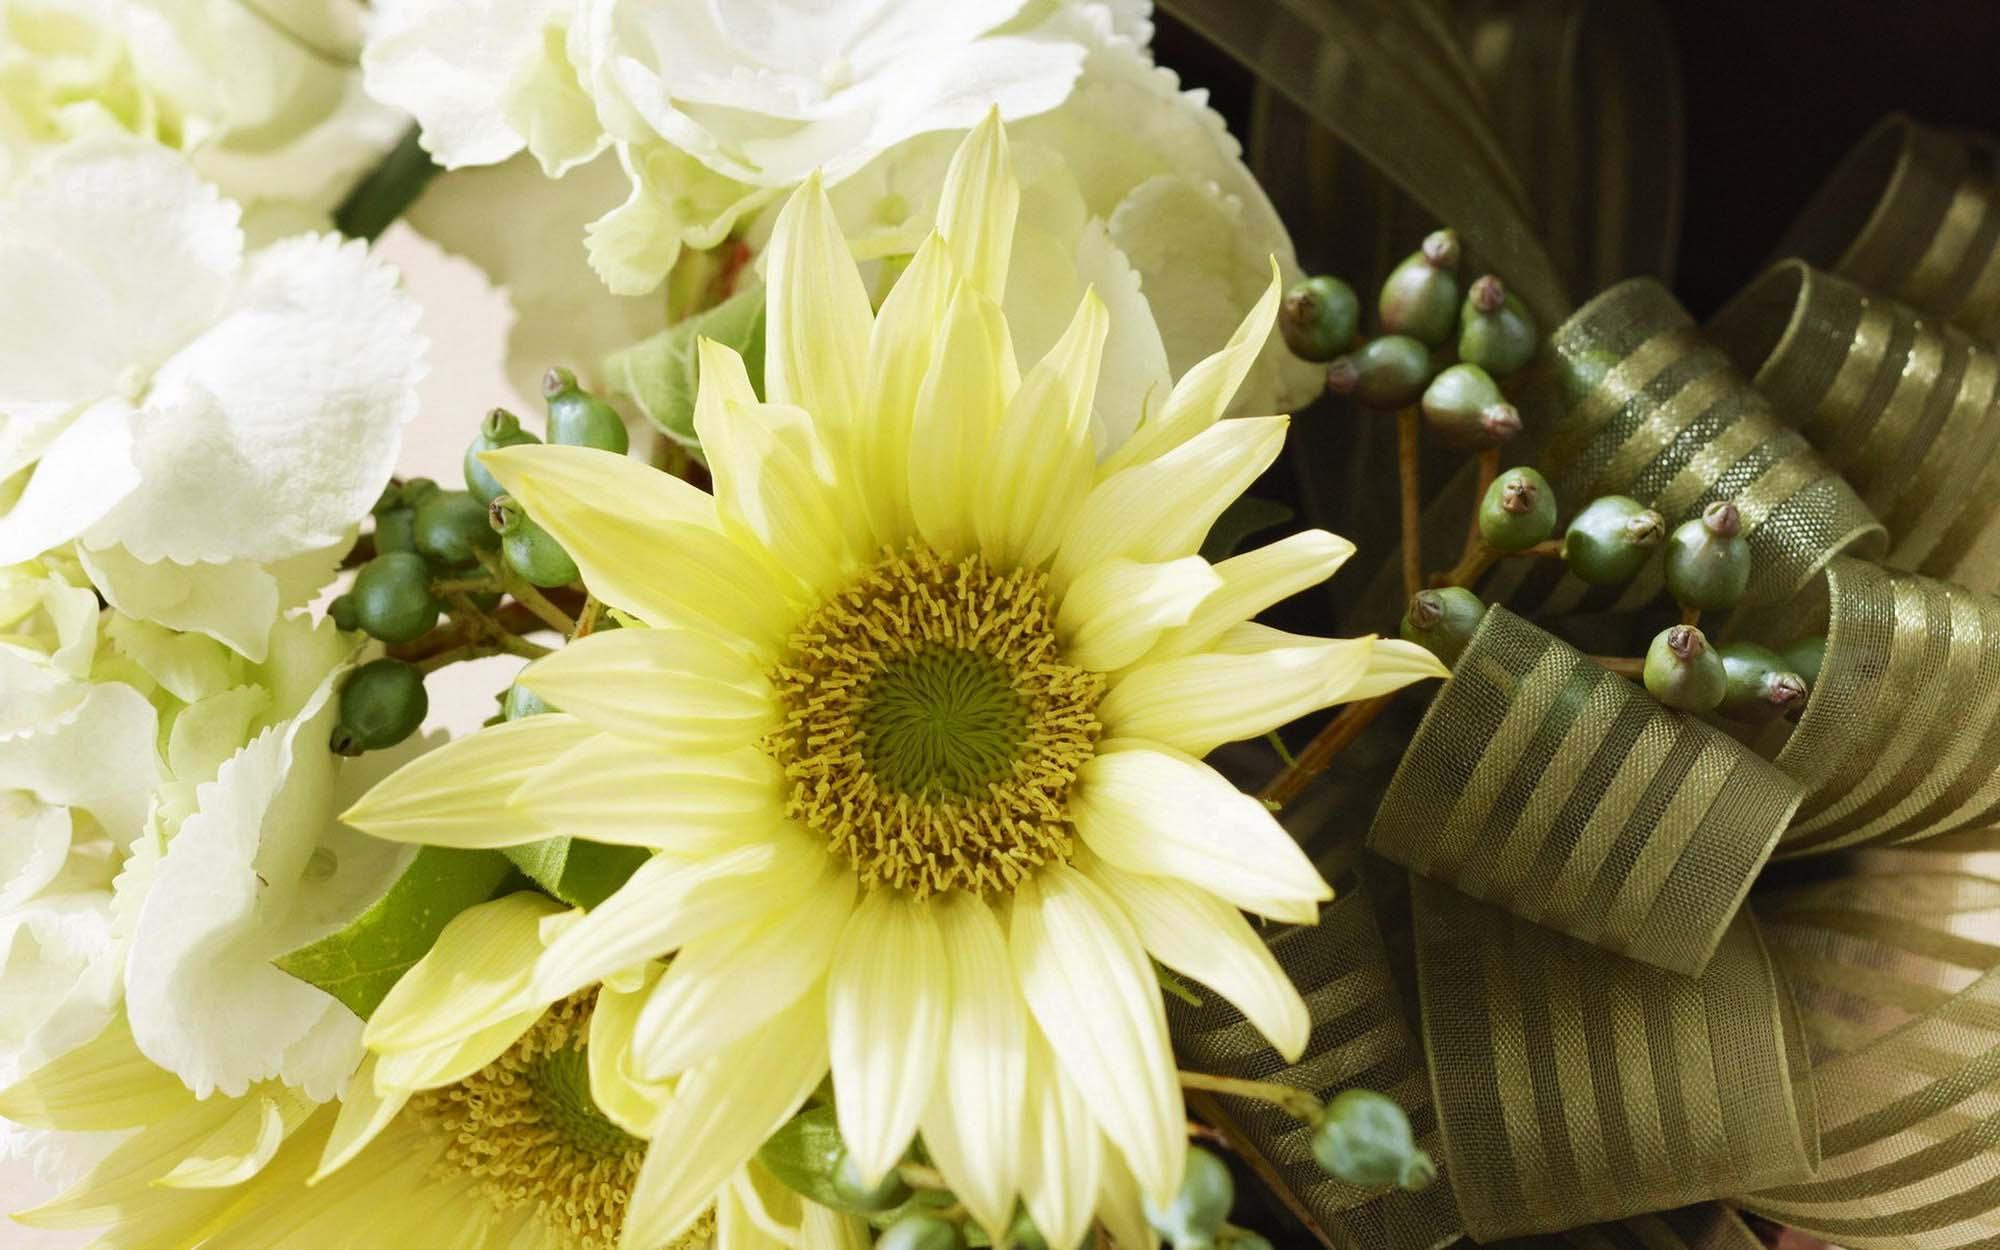 Васильки на фотографии картинки цветов васильков на лугах